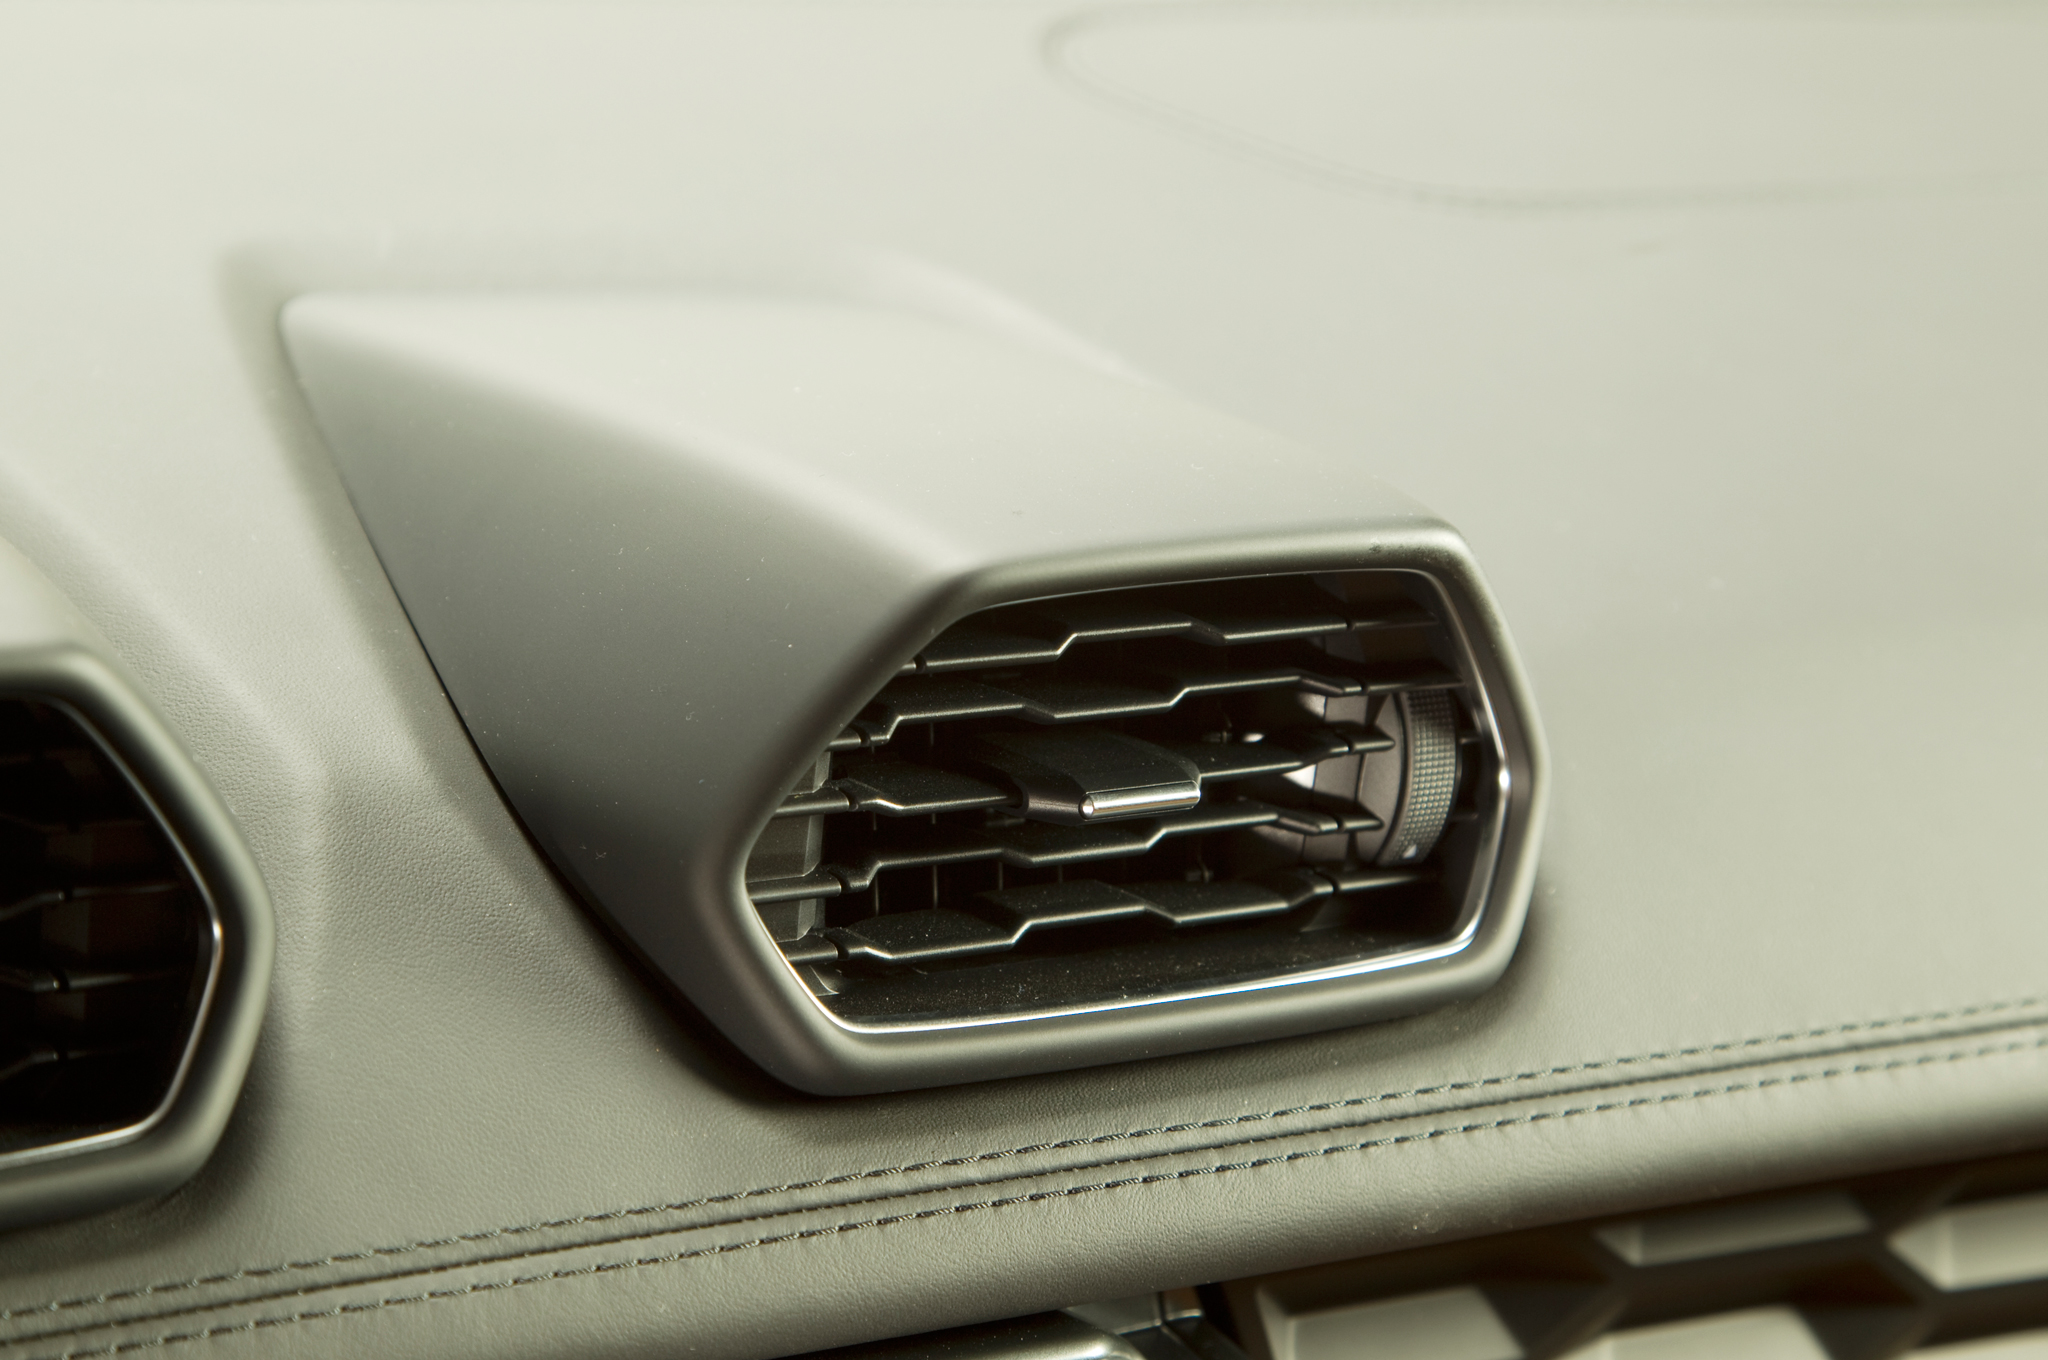 http—image.motortrend.com-f-roadtests-exotic-1312_2015_lamborghini_huracan_first_look-59411456-2015-Lamborghini-Huracan-air-vents